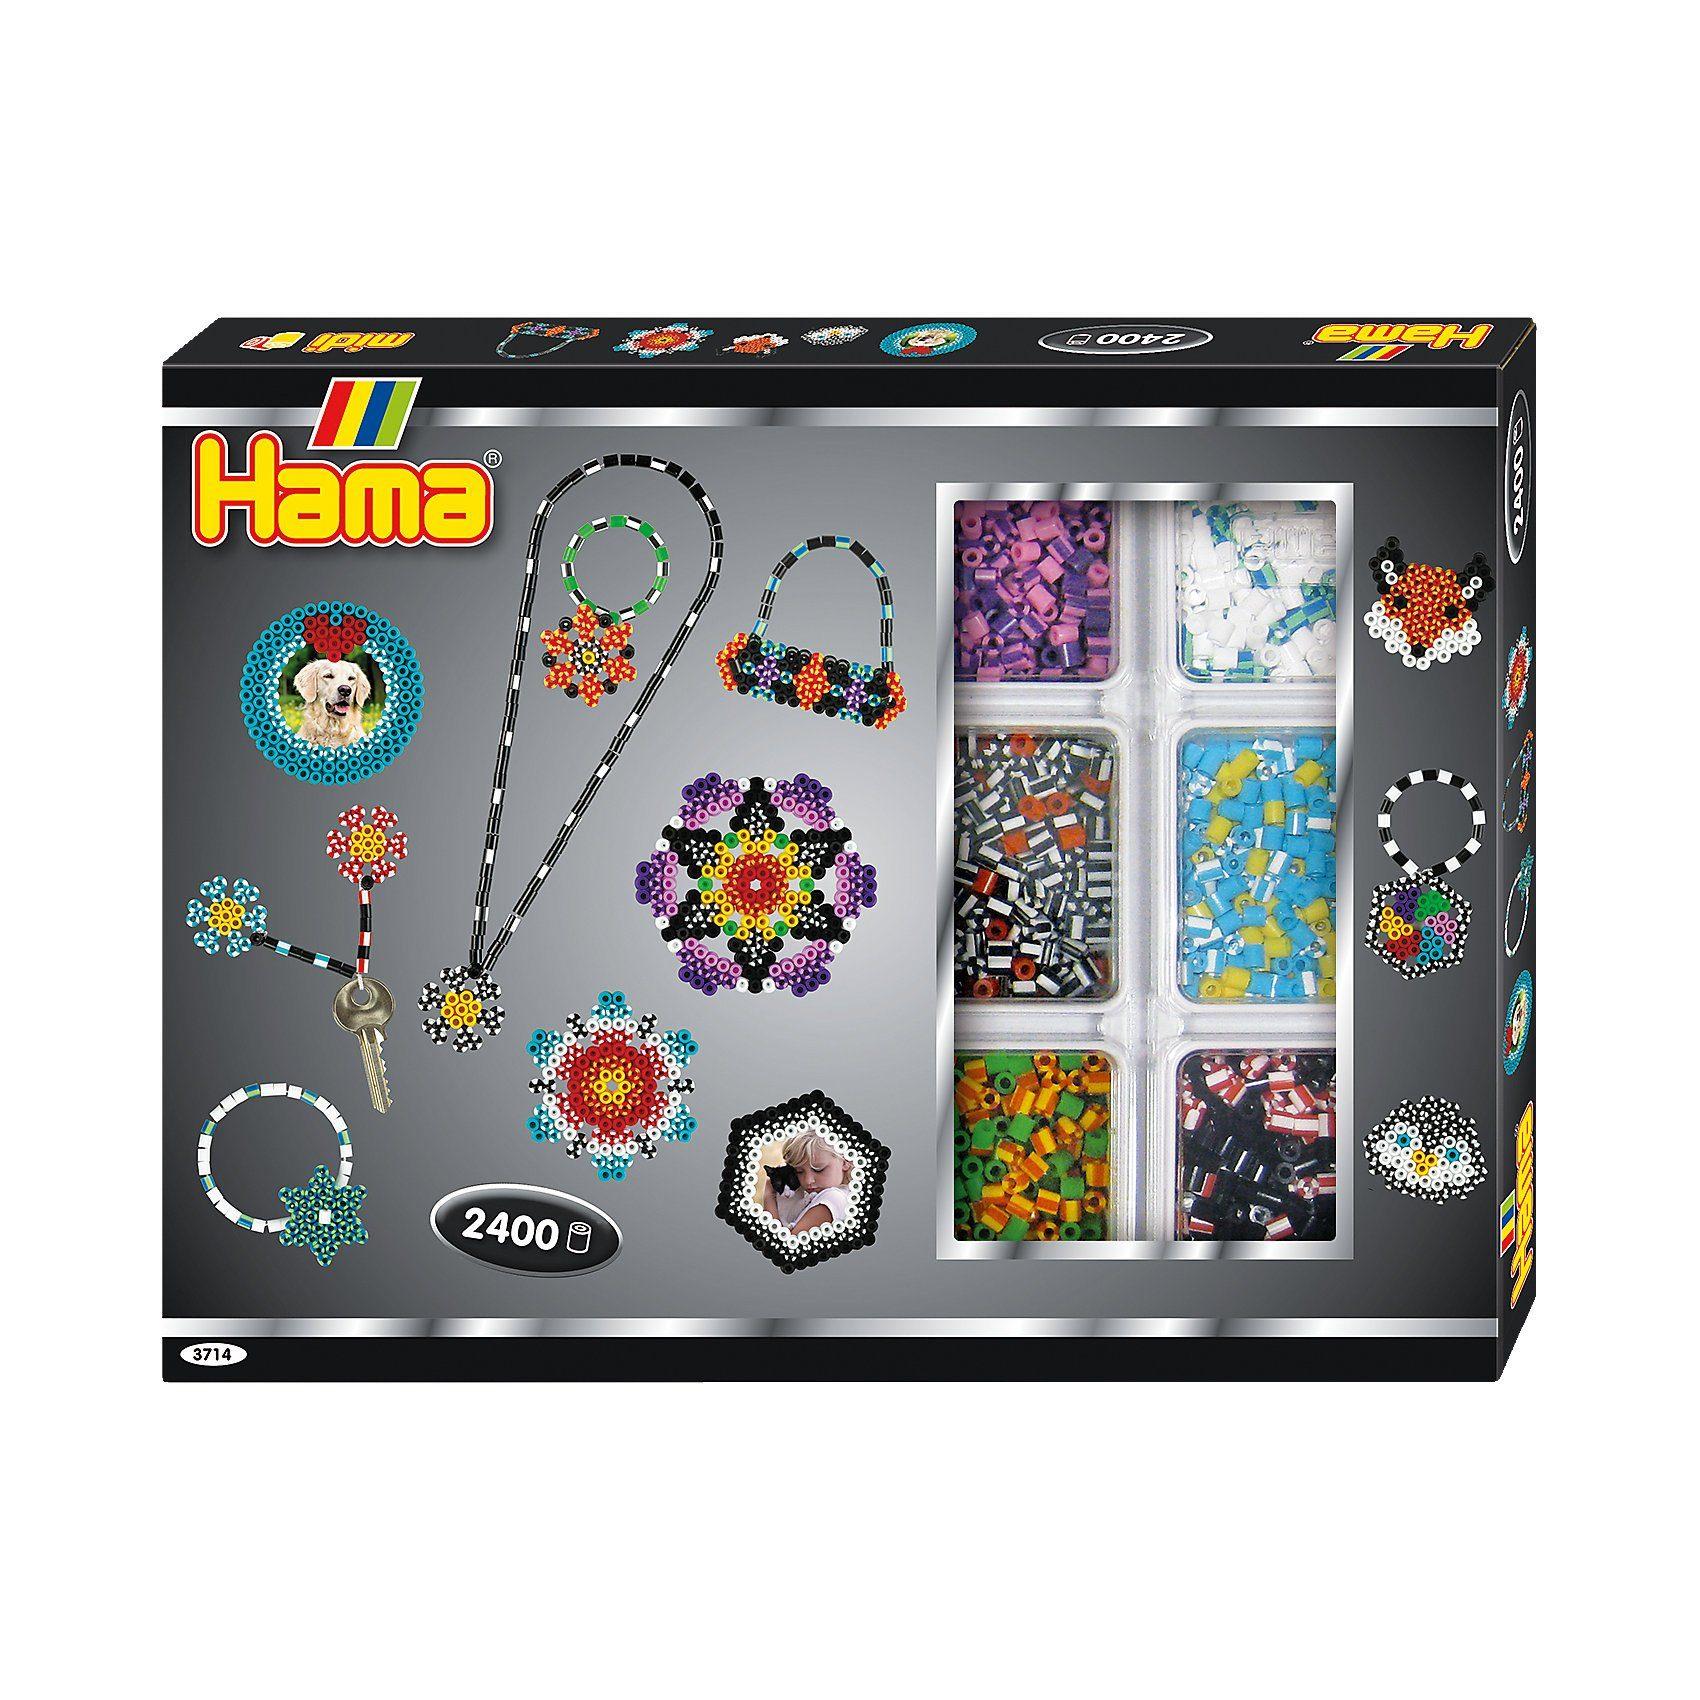 Hama Perlen HAMA 3714 Kreativbox gestreifte Perlen, 2.400 midi-Perlen &